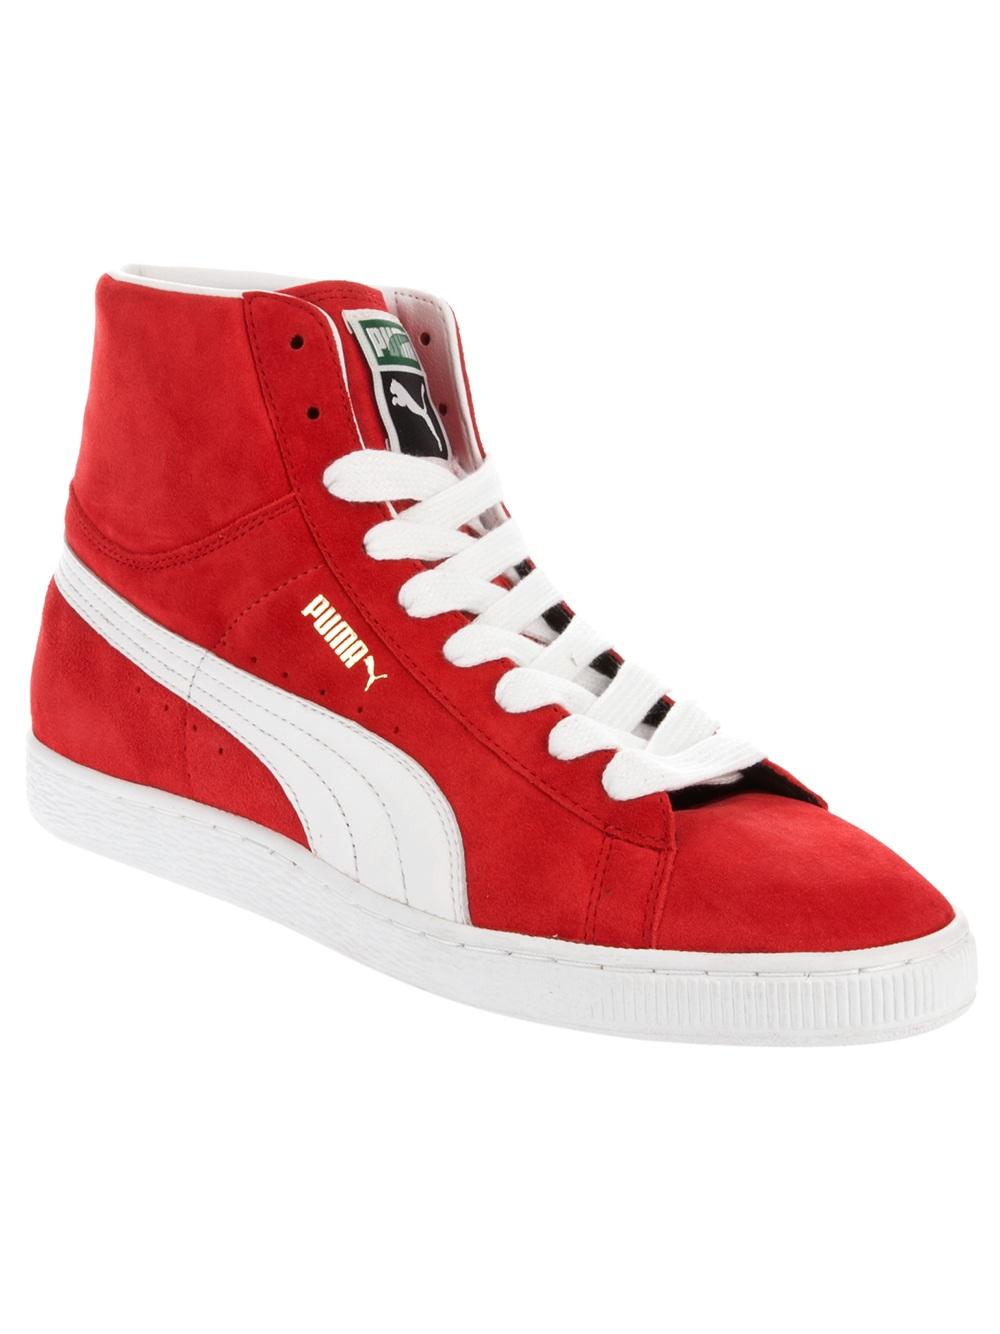 35237e8d3d3 PUMA Hi Top Sneakers in Red for Men - Lyst